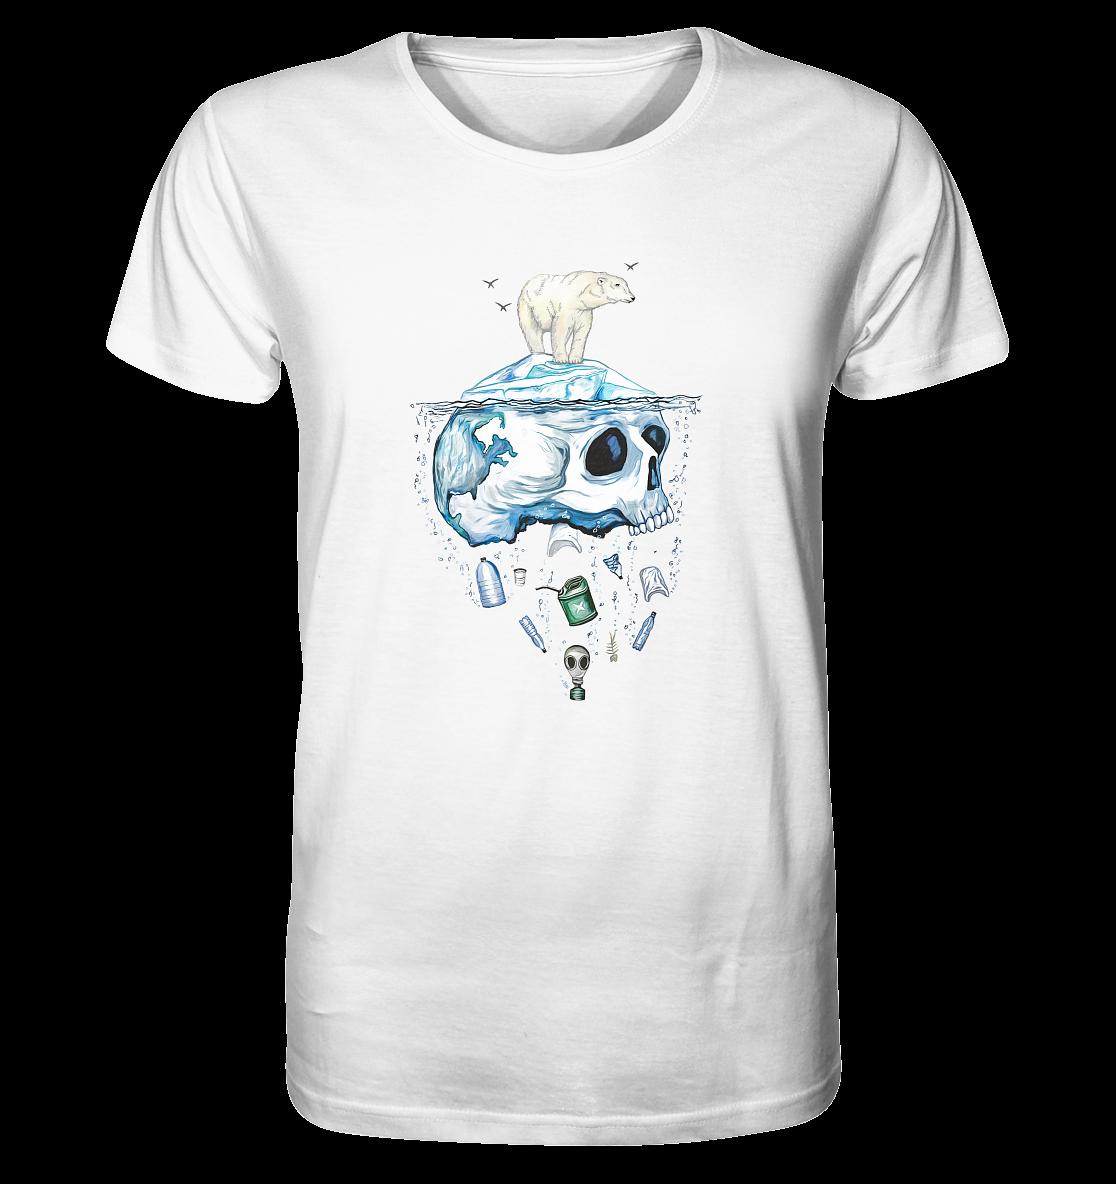 front-organic-shirt-f8f8f8-1116x.png